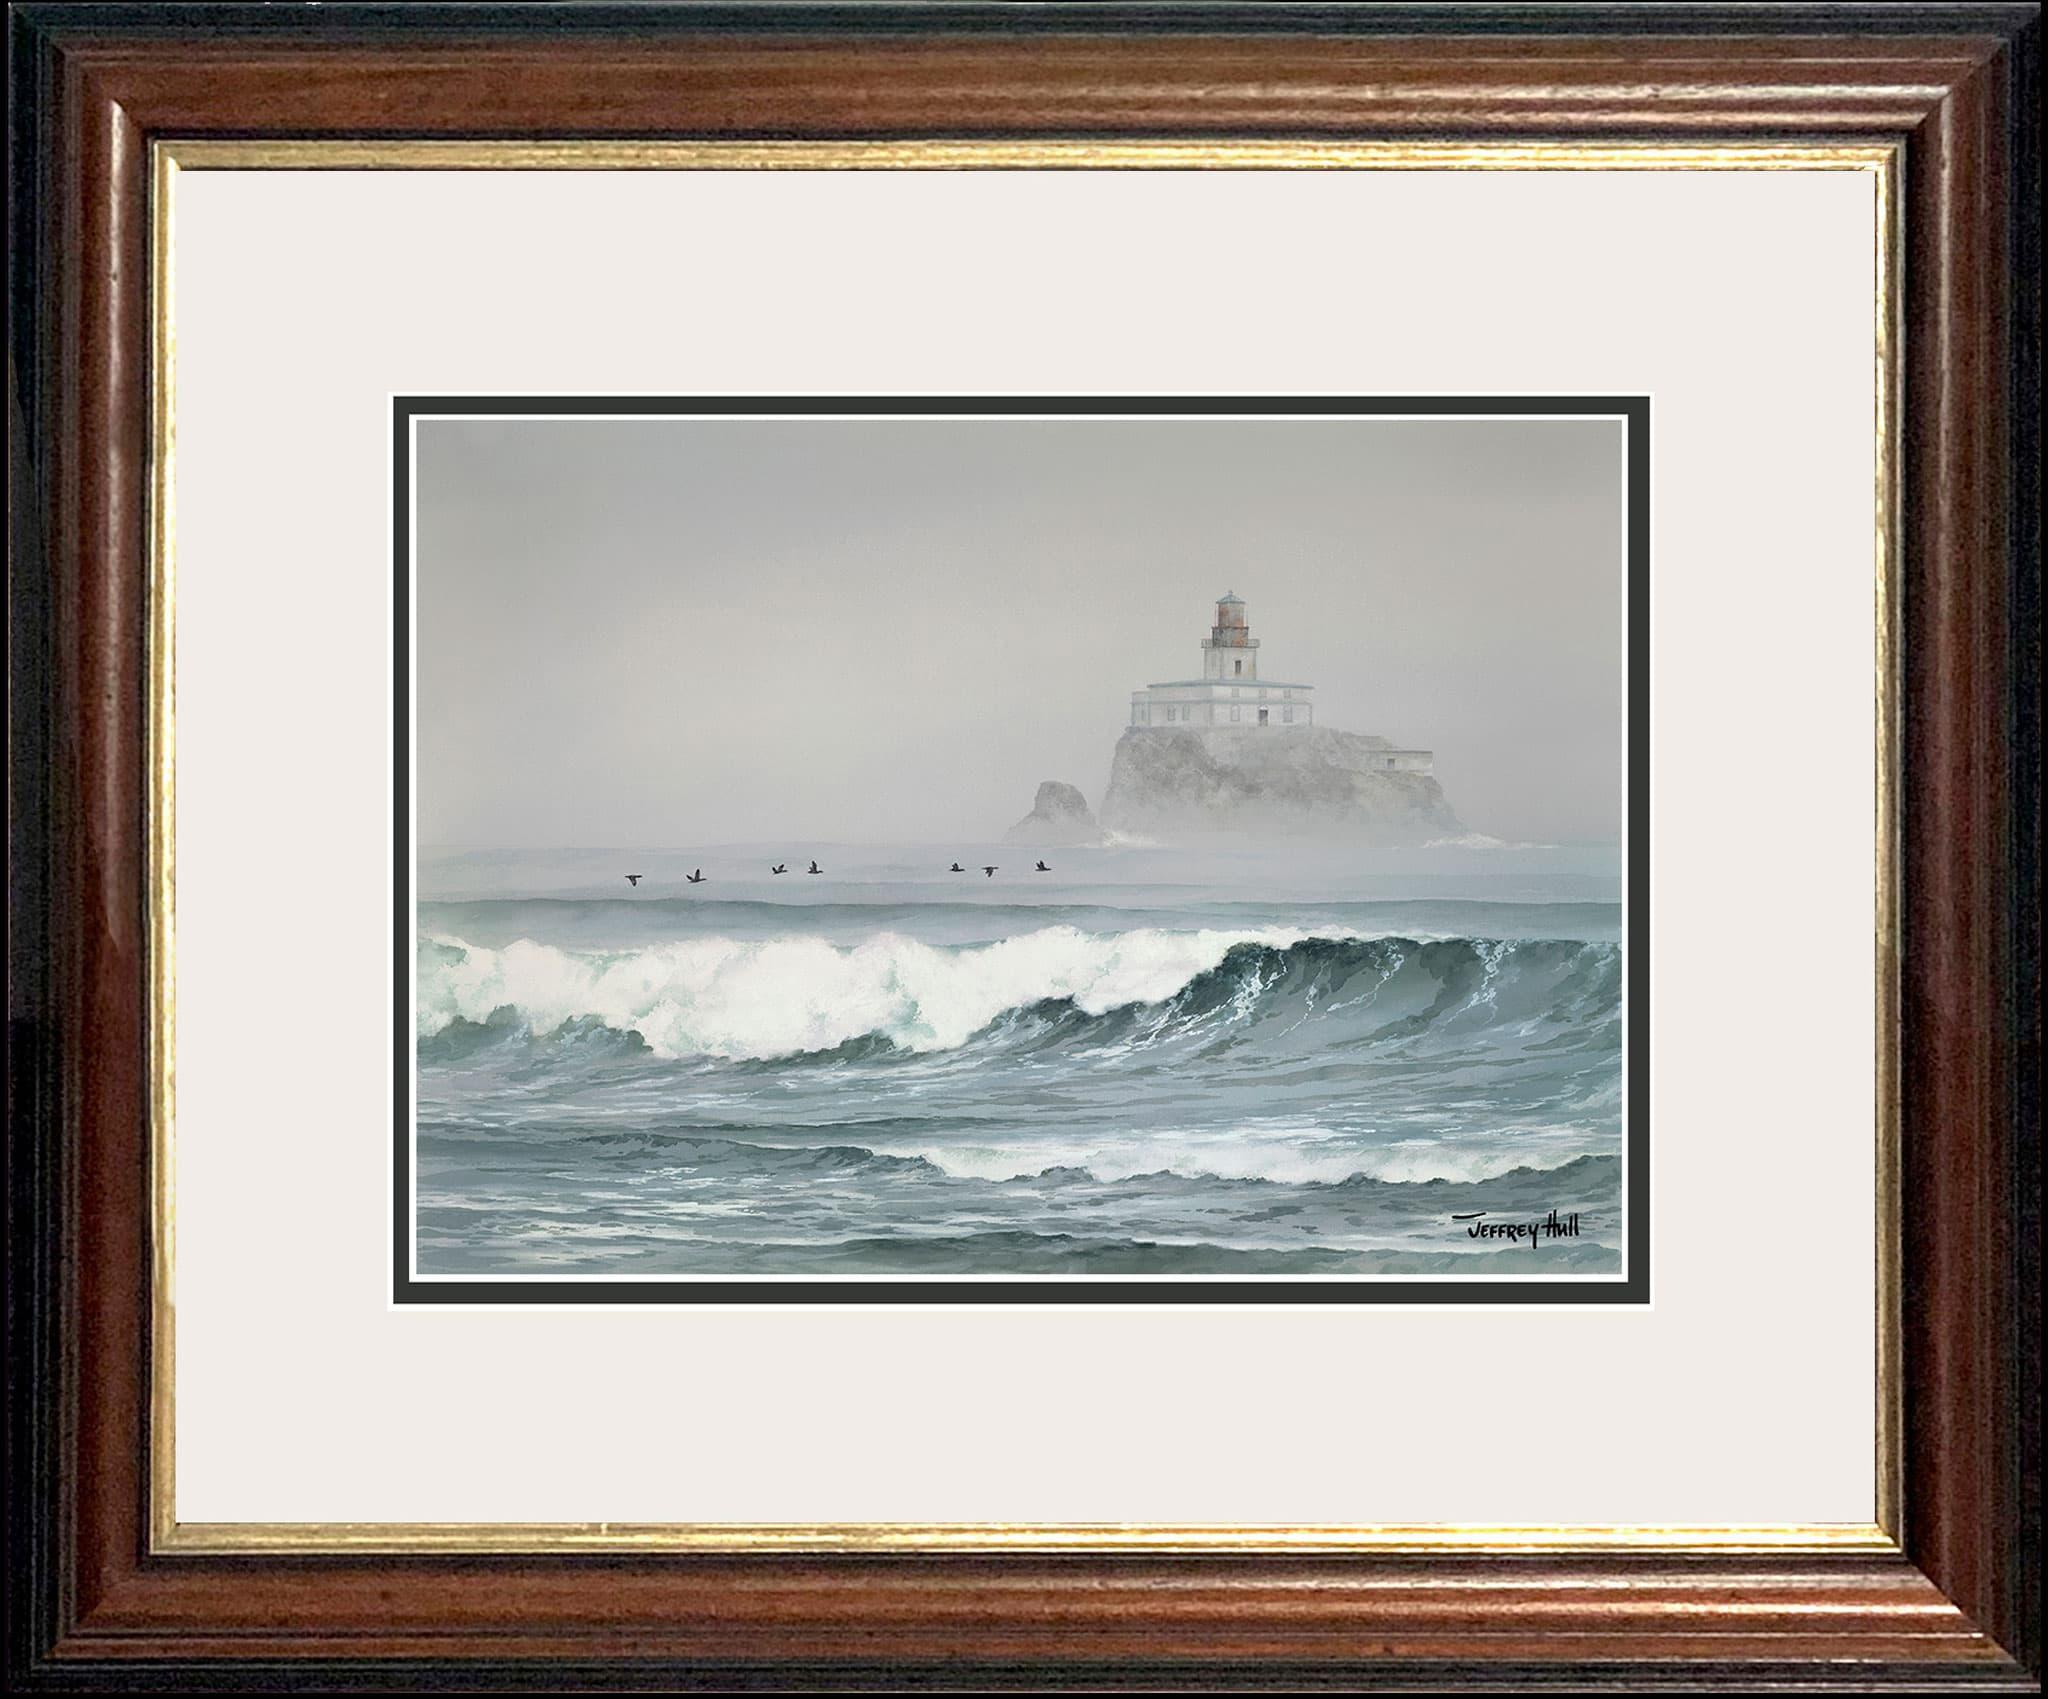 Tillamook-Rock-Lighthouse-OpenEd-Malabar-Talc-Dark-Shale-4-Website-2021